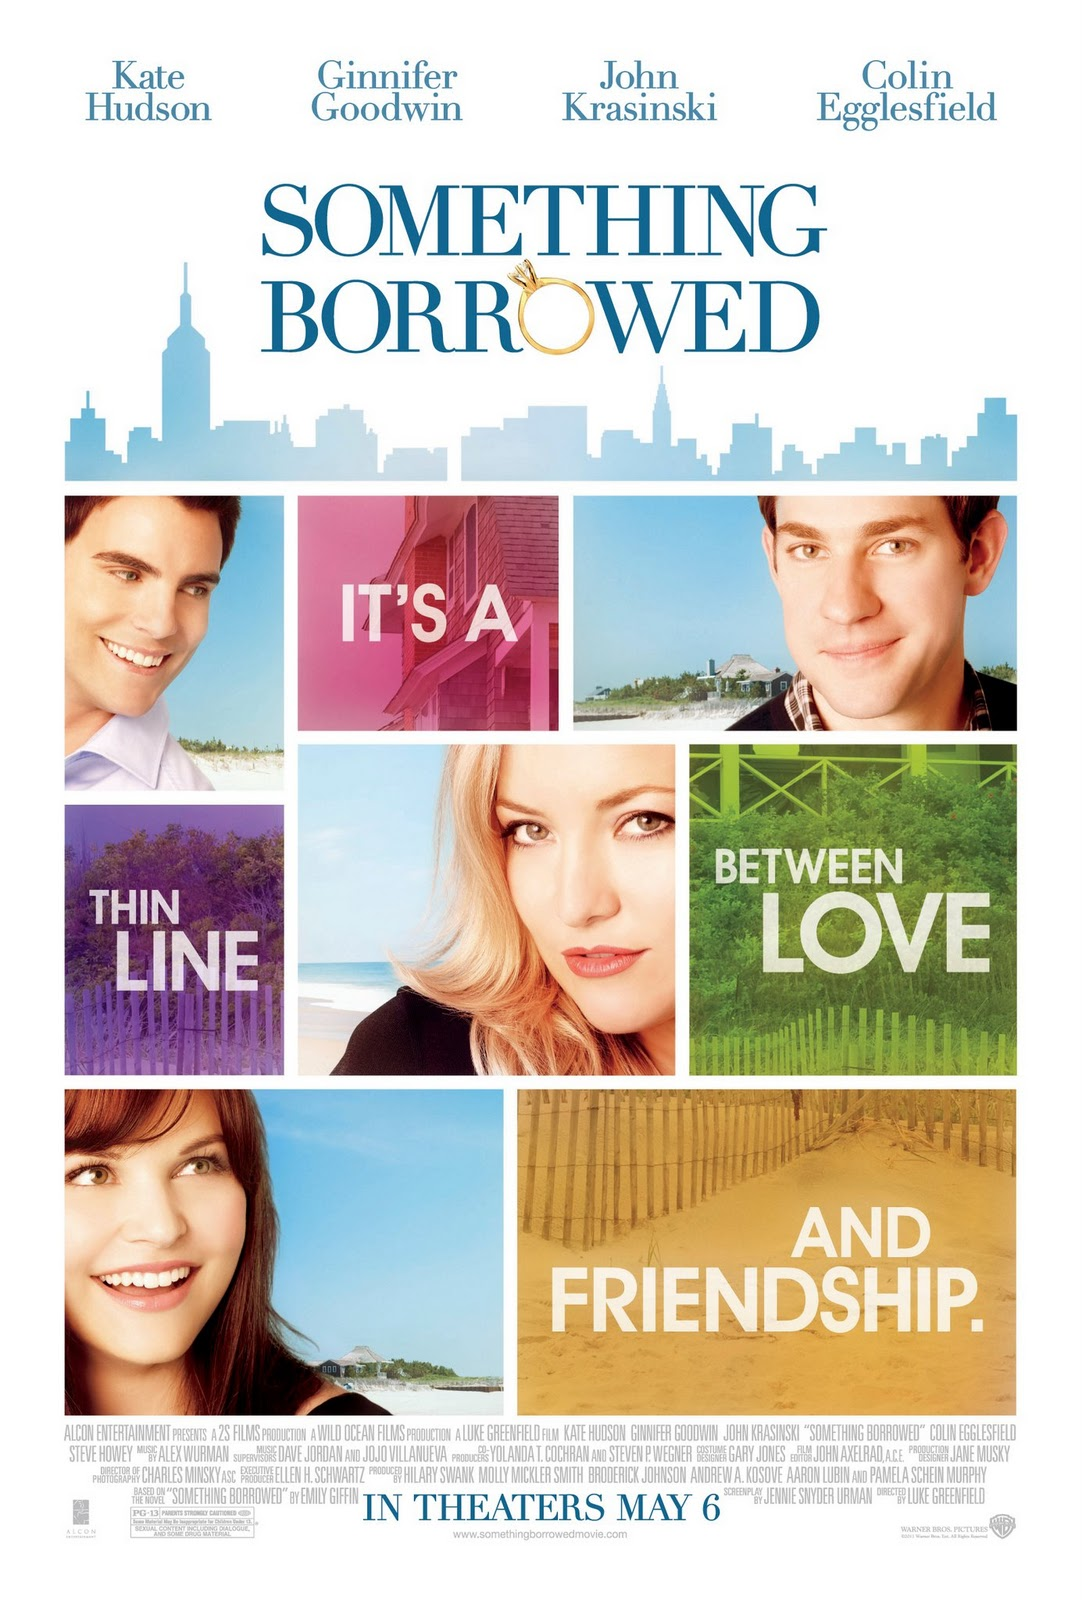 http://4.bp.blogspot.com/-Z0hWe1UHE3s/TopvlykVj3I/AAAAAAAABx8/zxGafiGpGpY/s1600/Something-Borrowed-Movie-Poster-John-Krazinski-Kate-Hudson.jpg